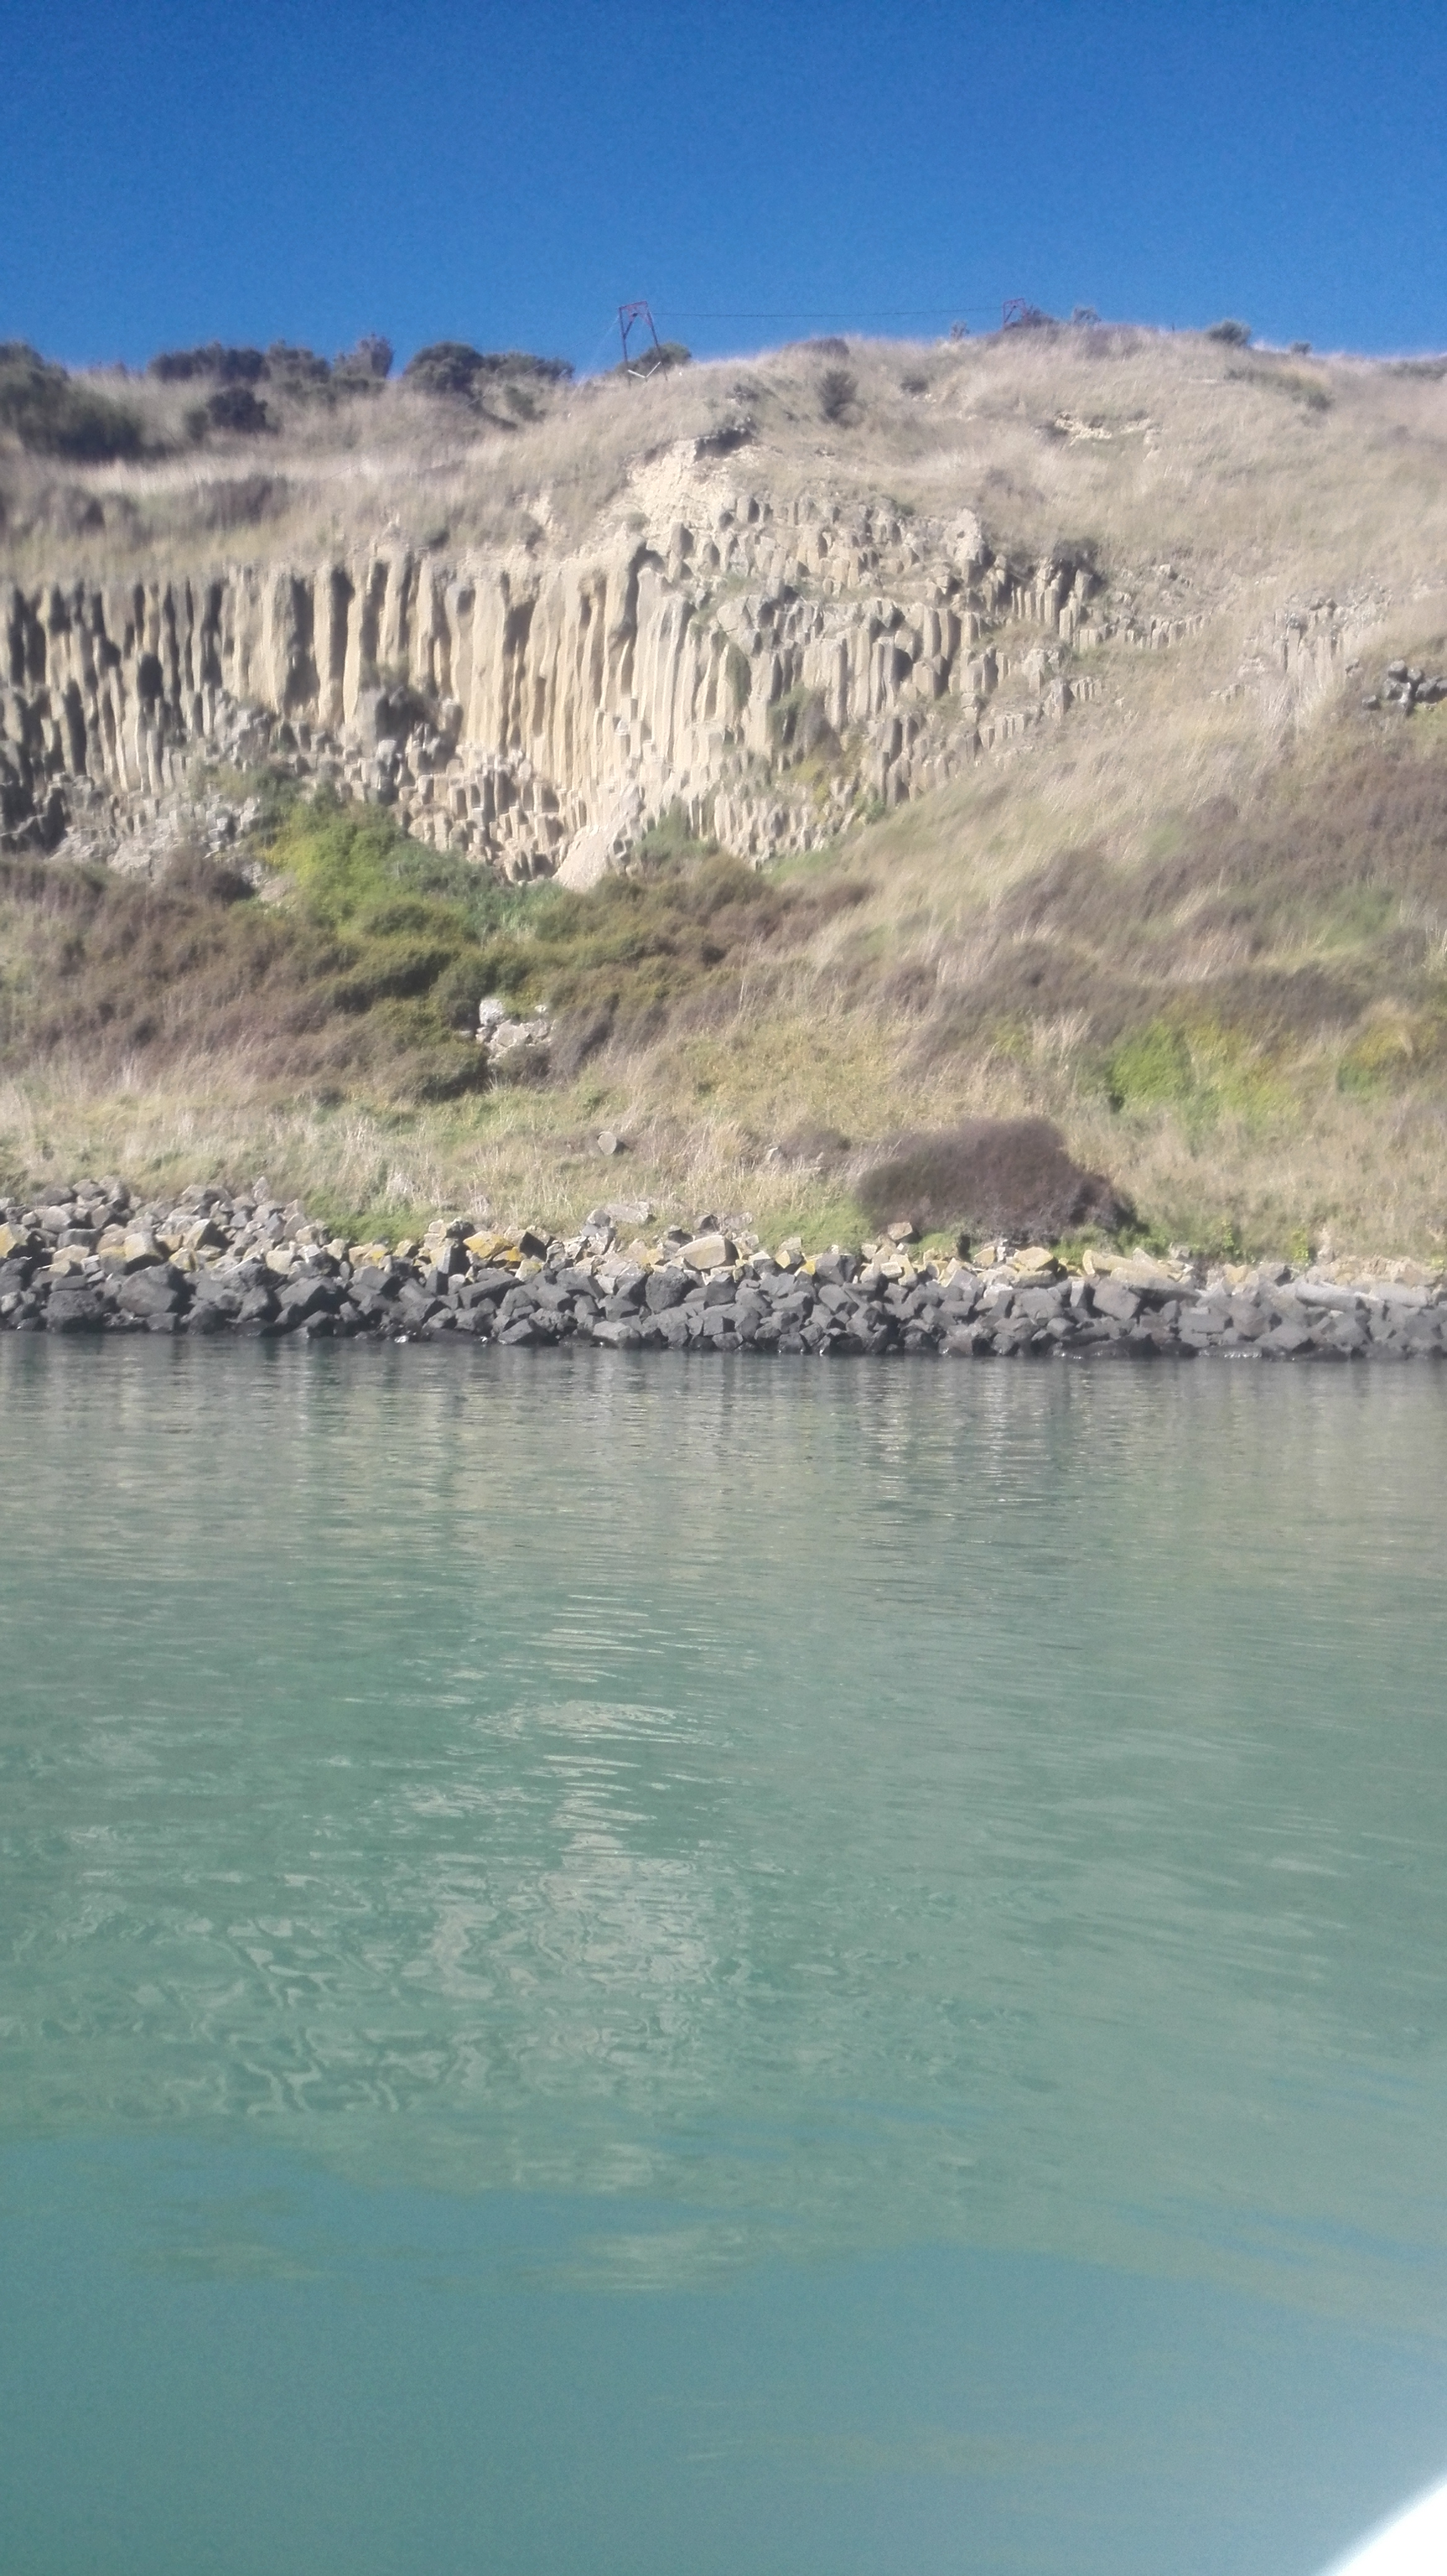 3-sandstone-Quail-Island-Lyttelton.jpg